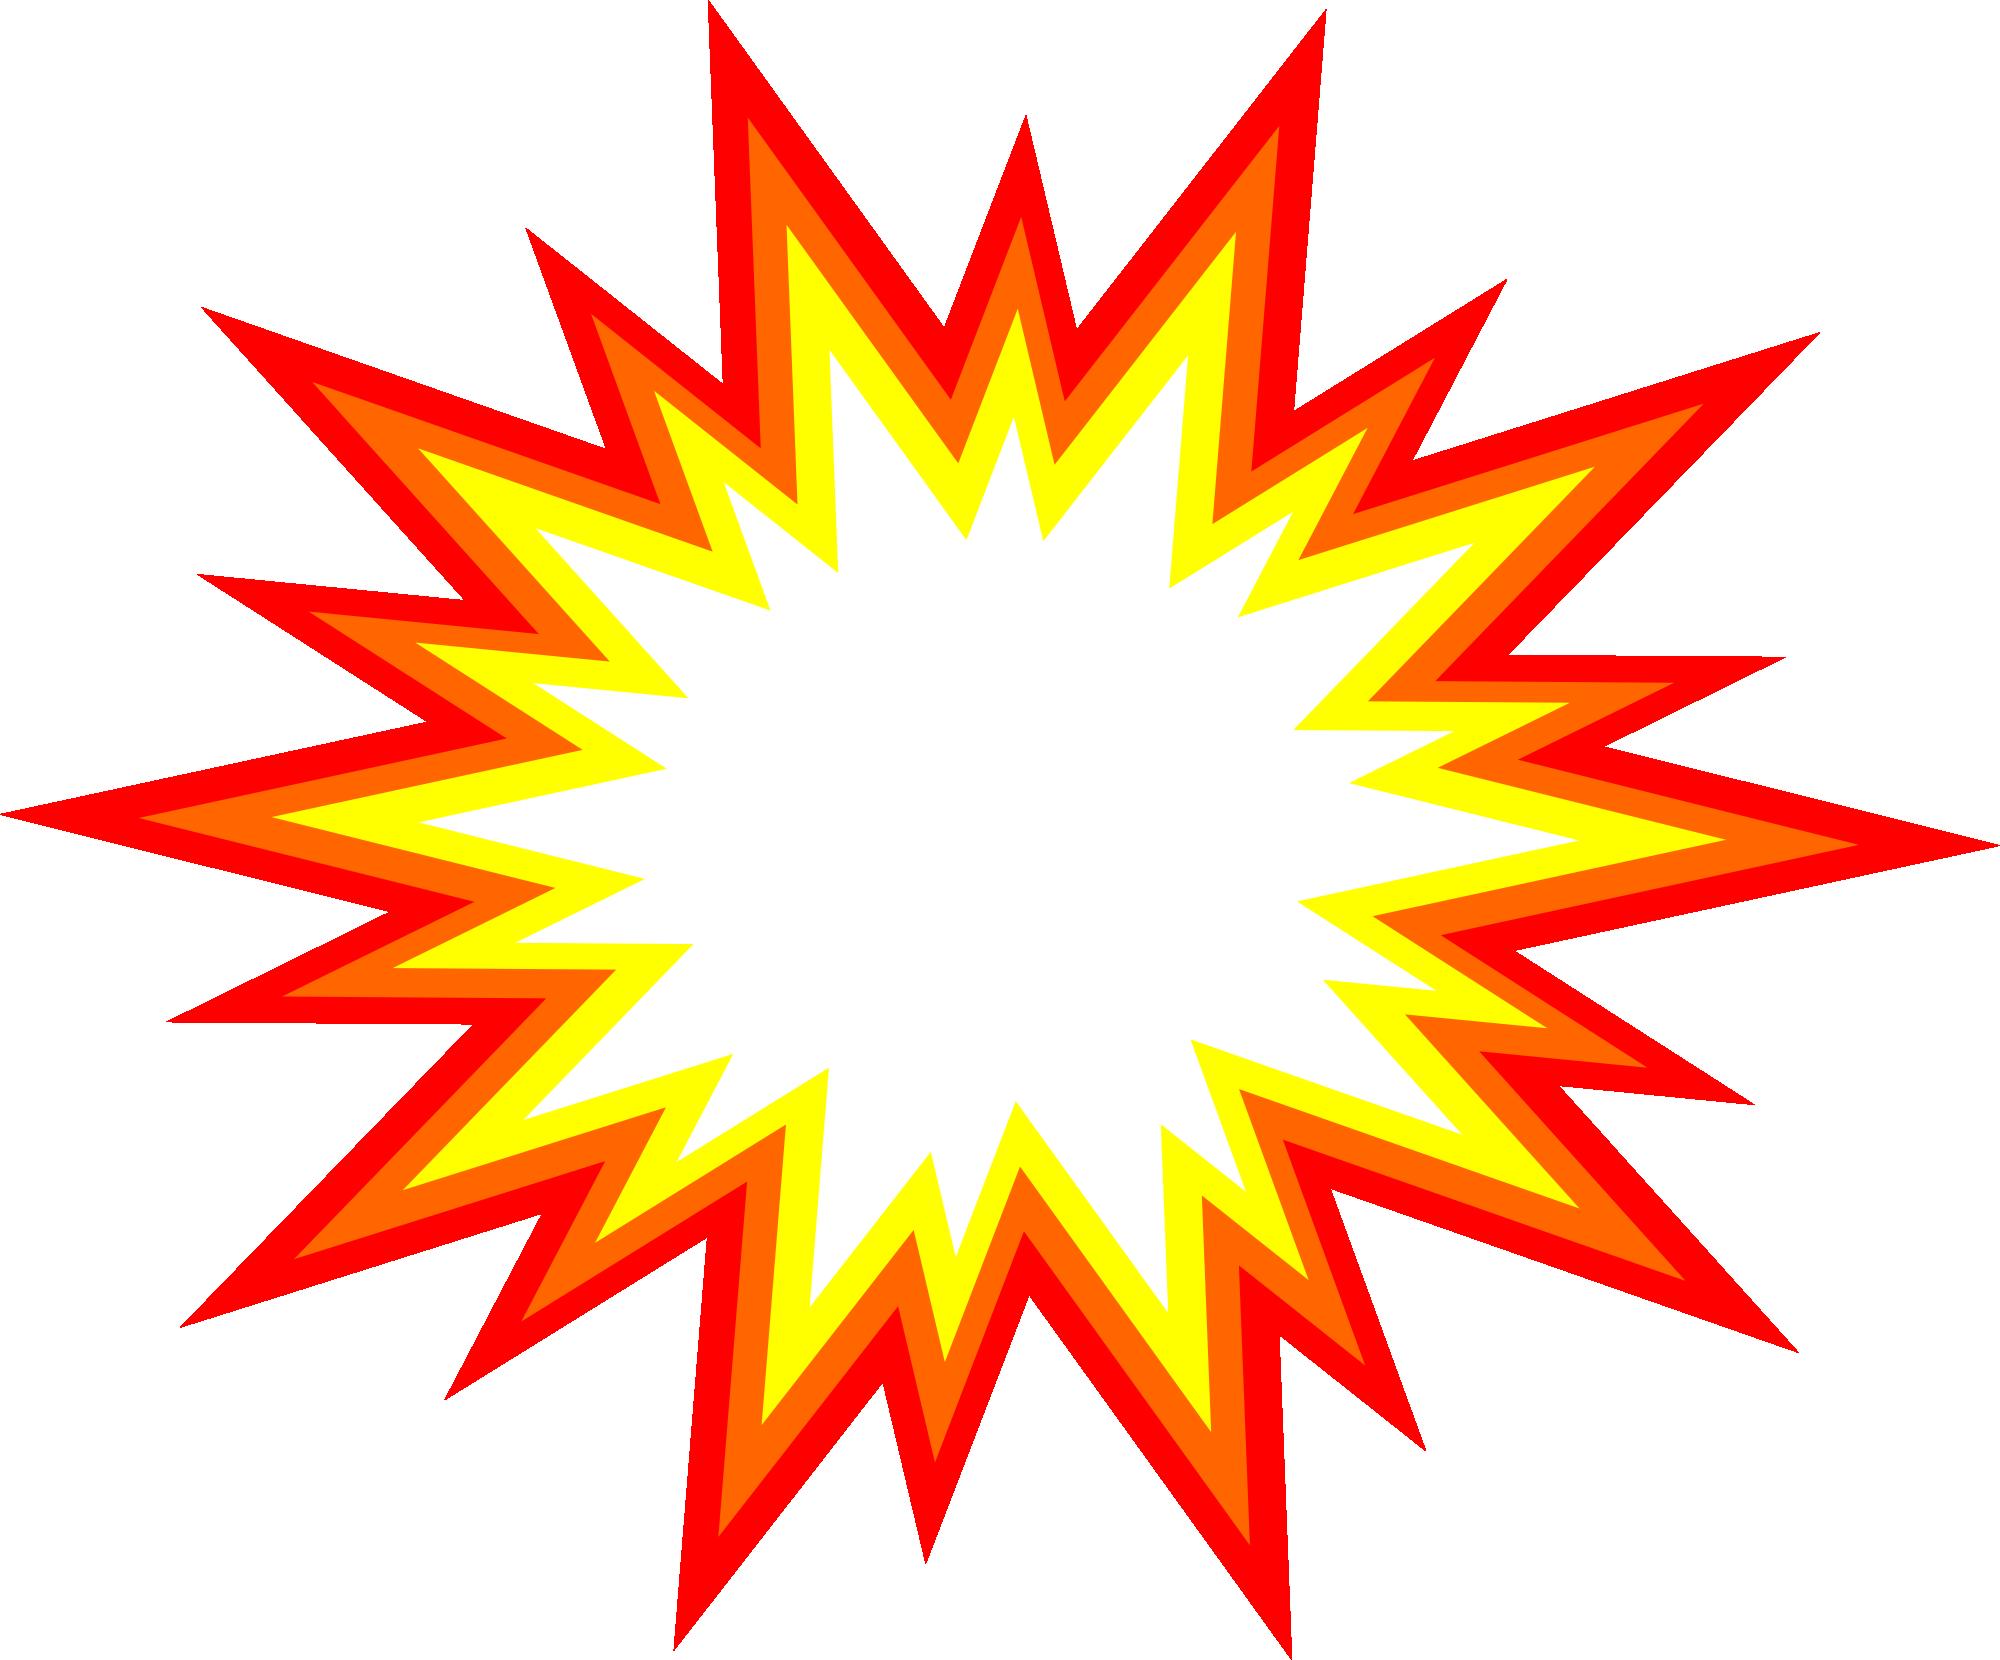 Star burst clipart transparent library 6 Starburst Explosion Comic Vector (PNG Transparent, SVG) | OnlyGFX.com transparent library